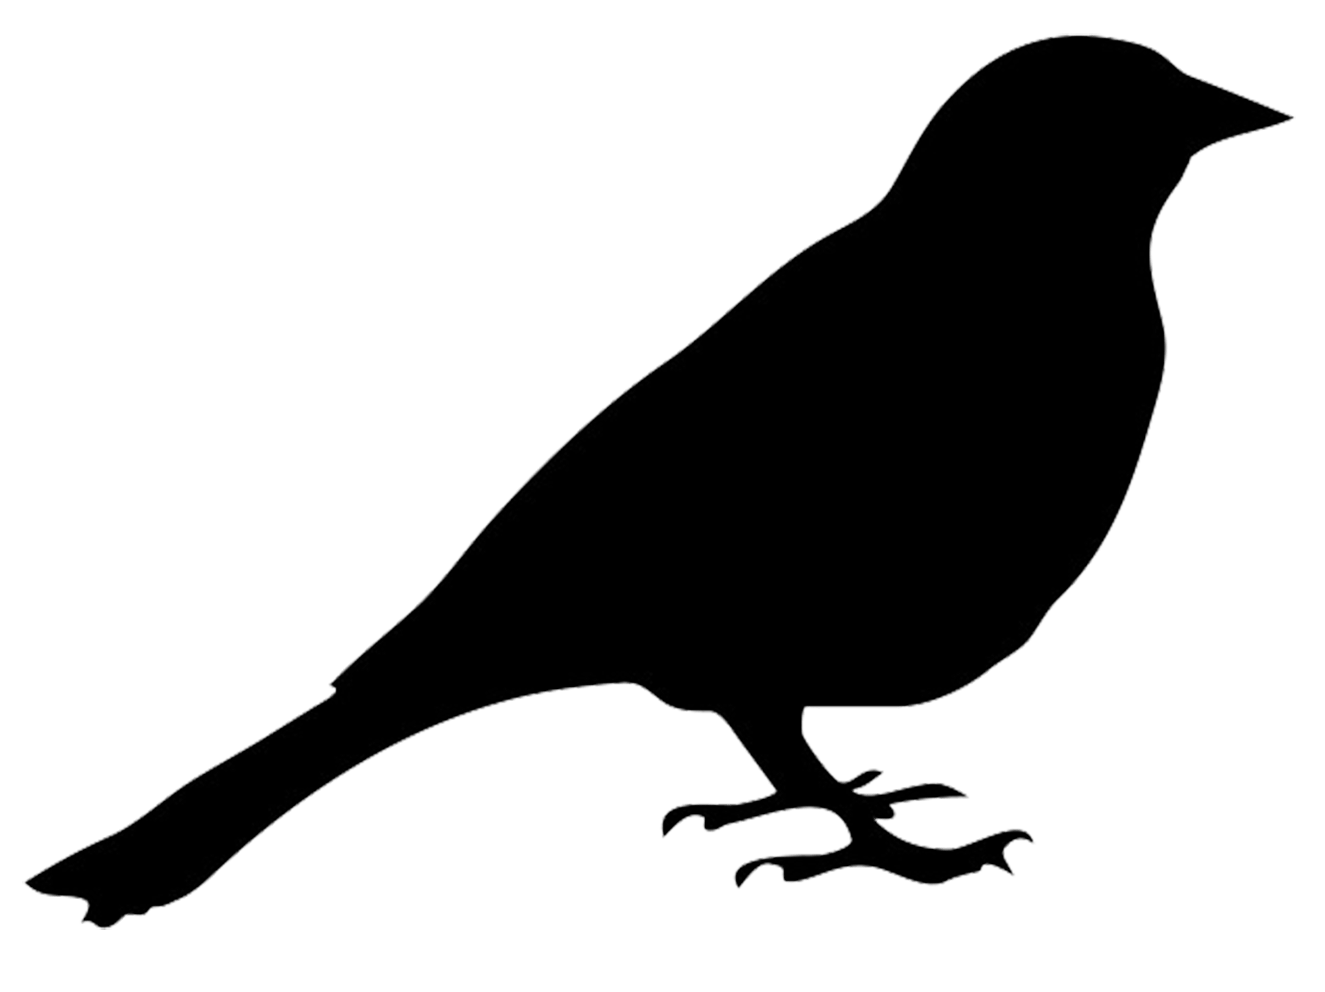 bird silhouette transparent png stickpng rh stickpng com flying bird silhouette clip art free bird silhouette clip art free